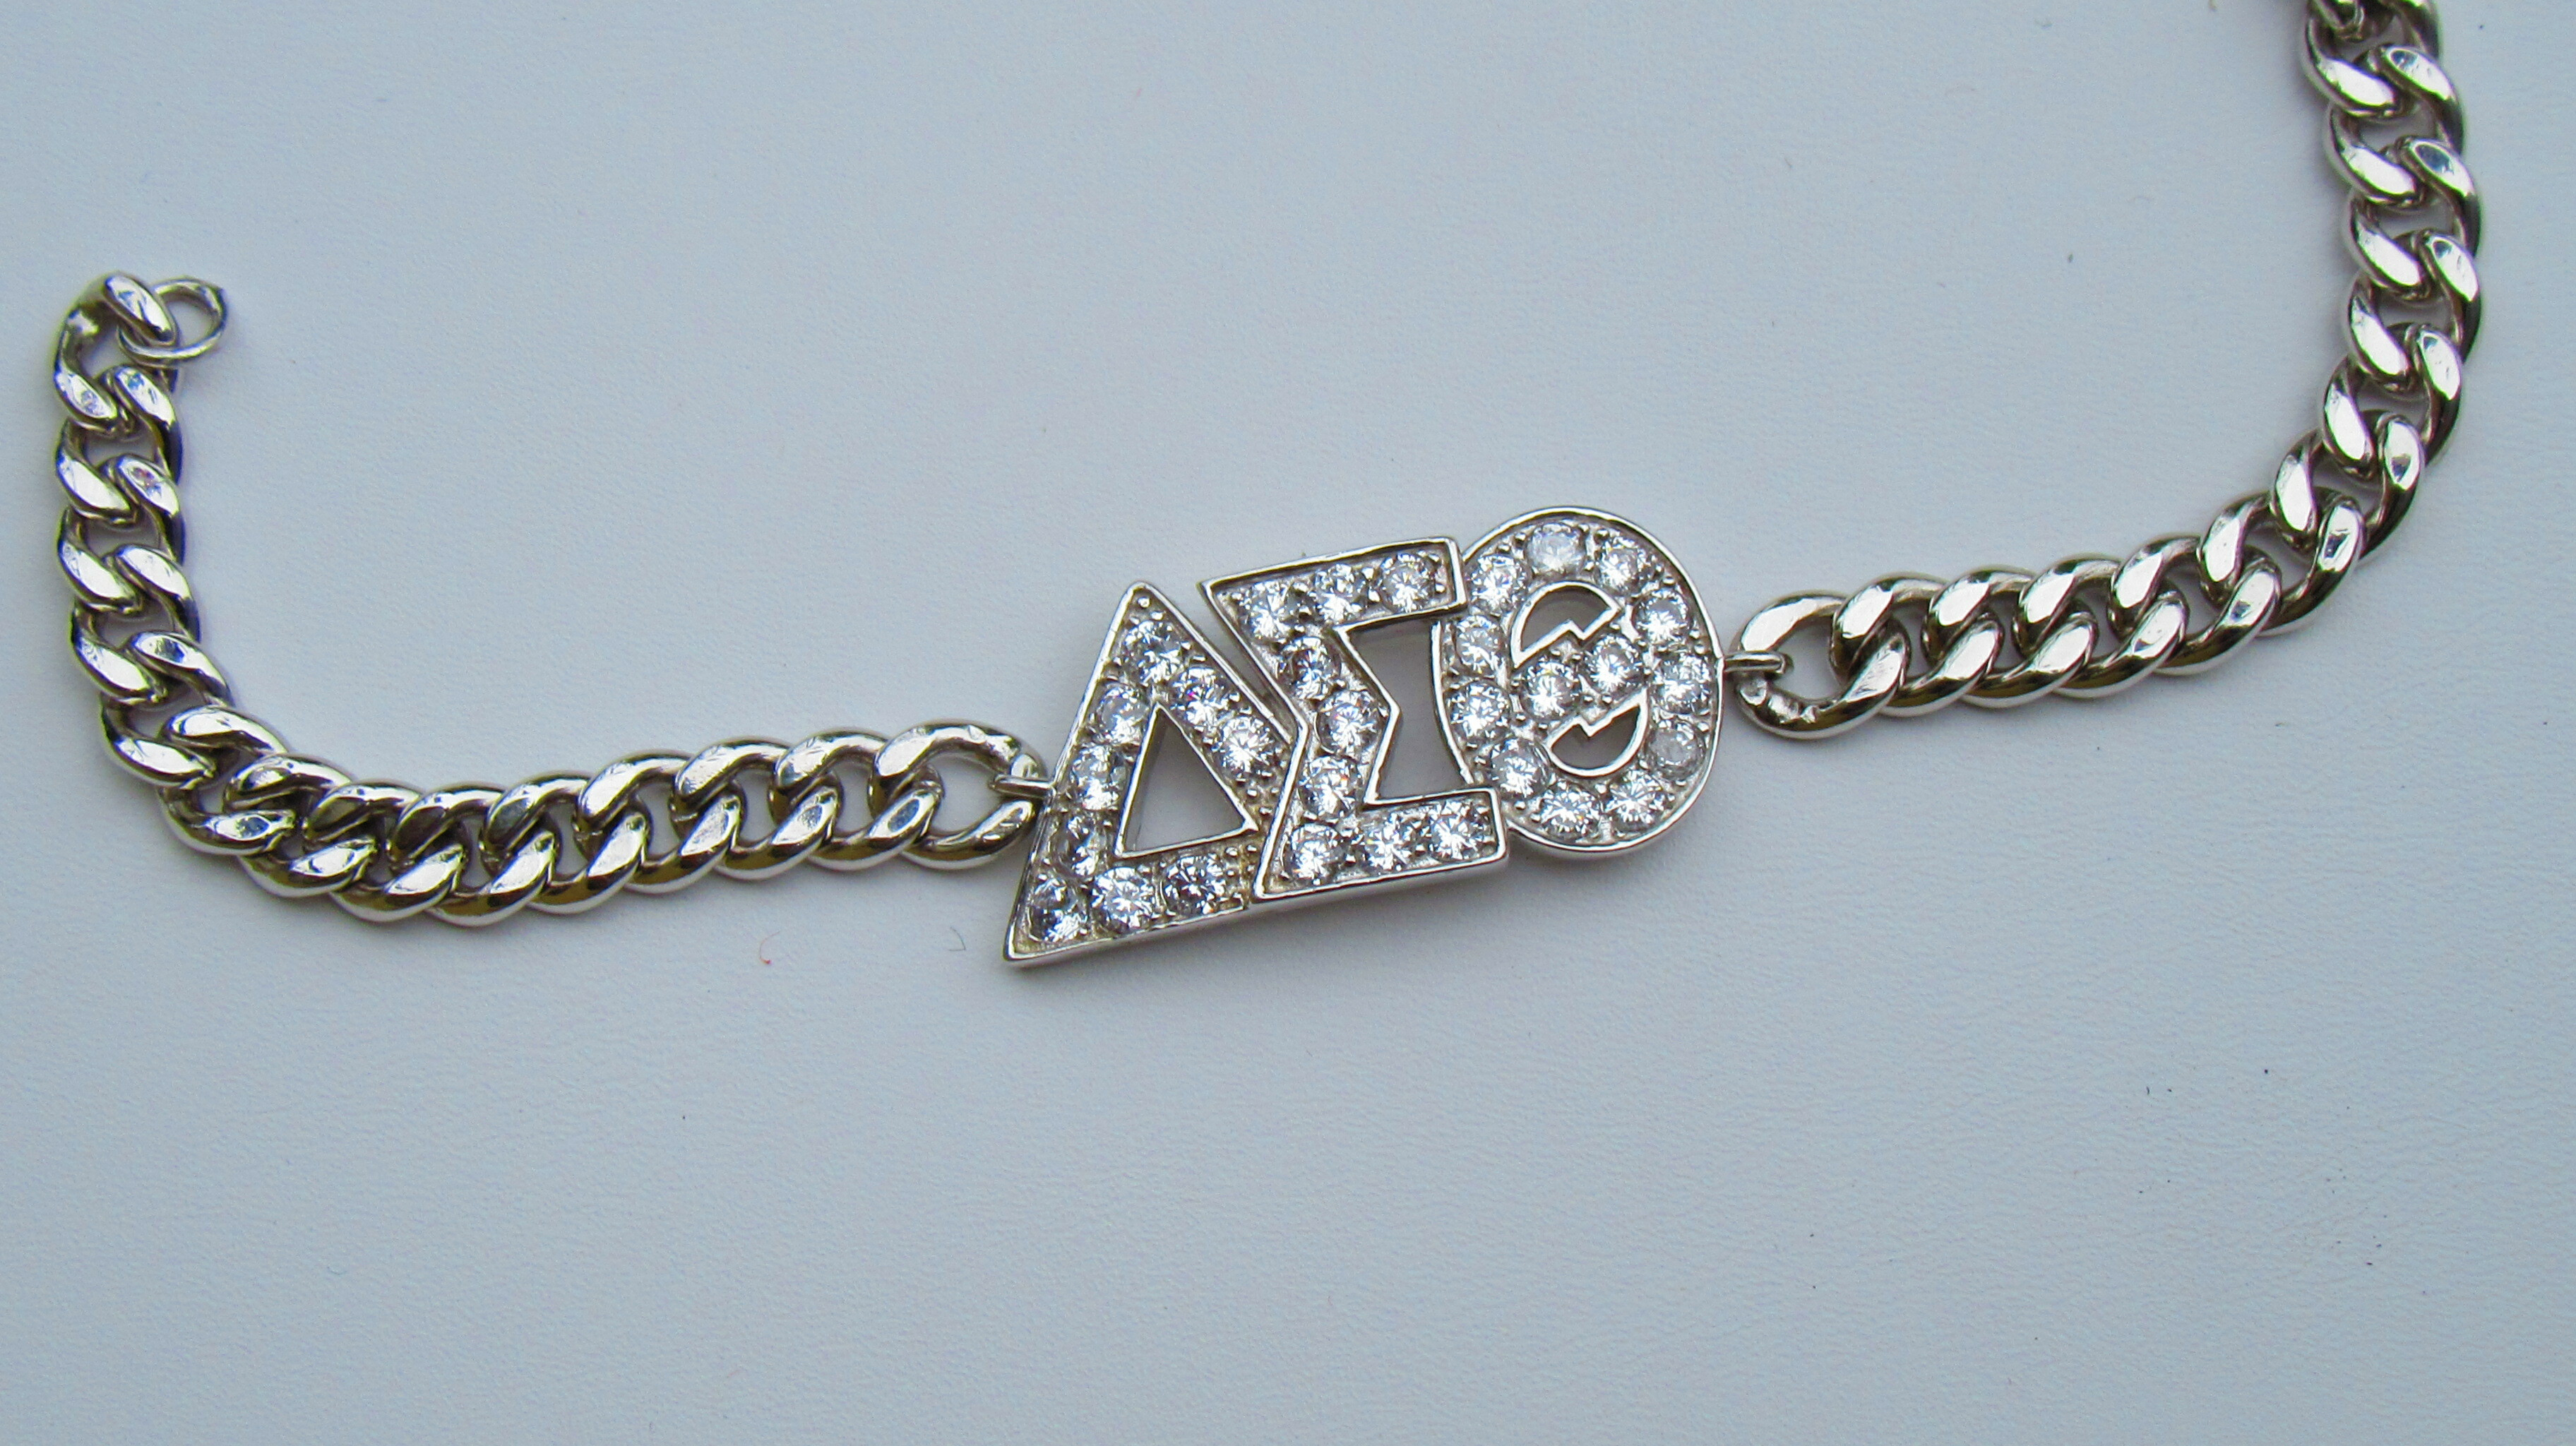 DST Cuban Sterling Link Bracelet - Longer 00107